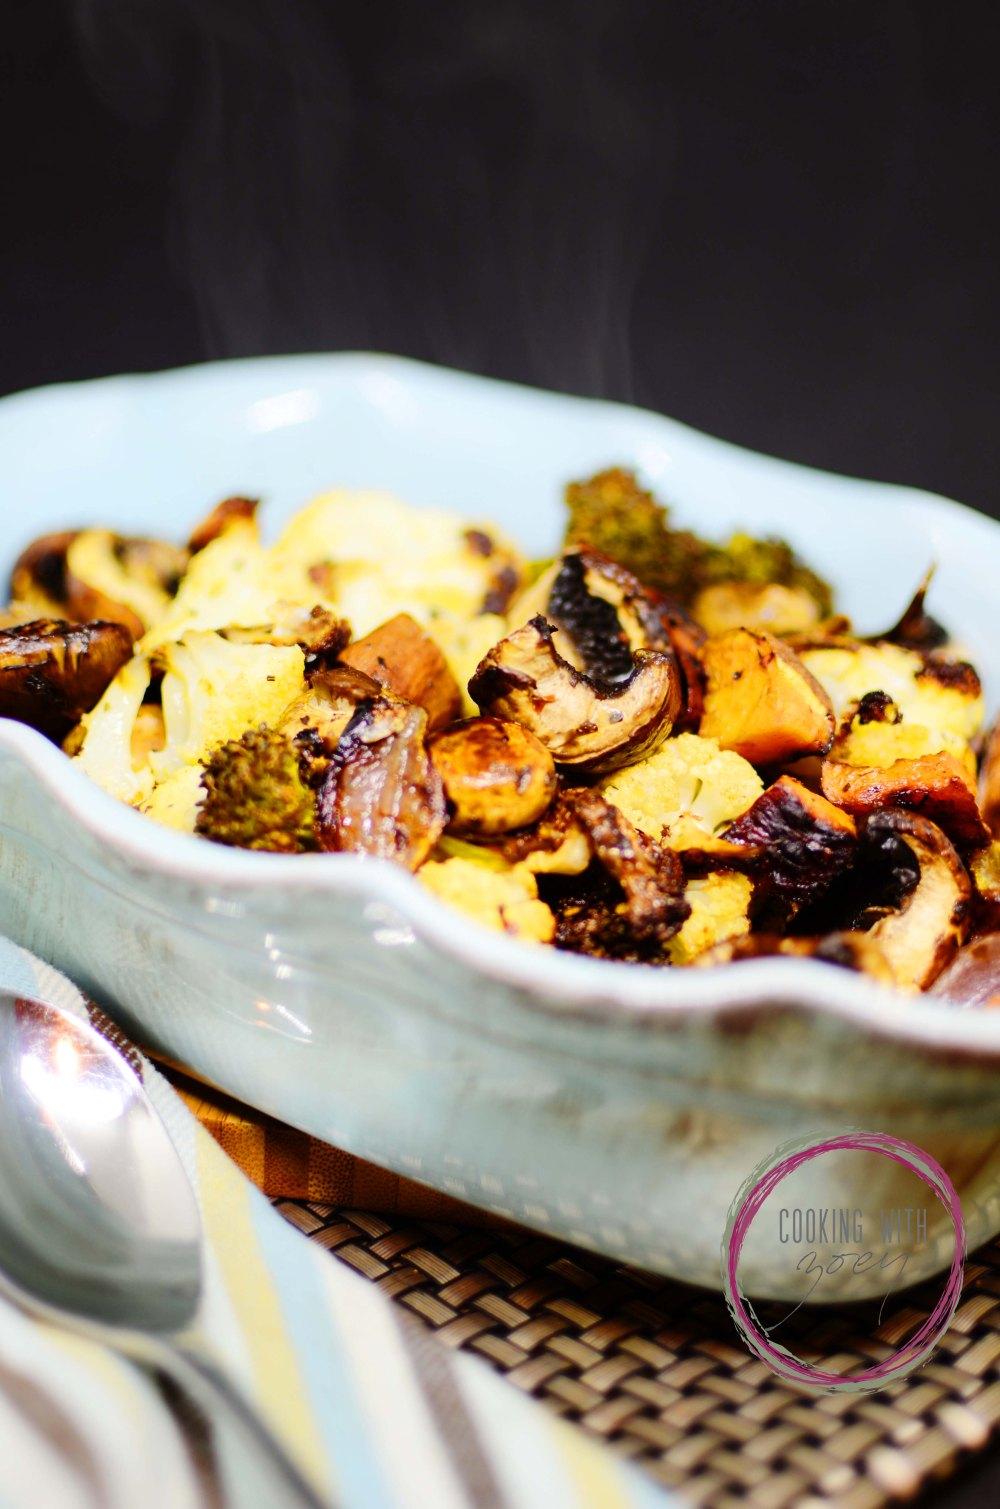 Roast_veggies_cooking_with_zo